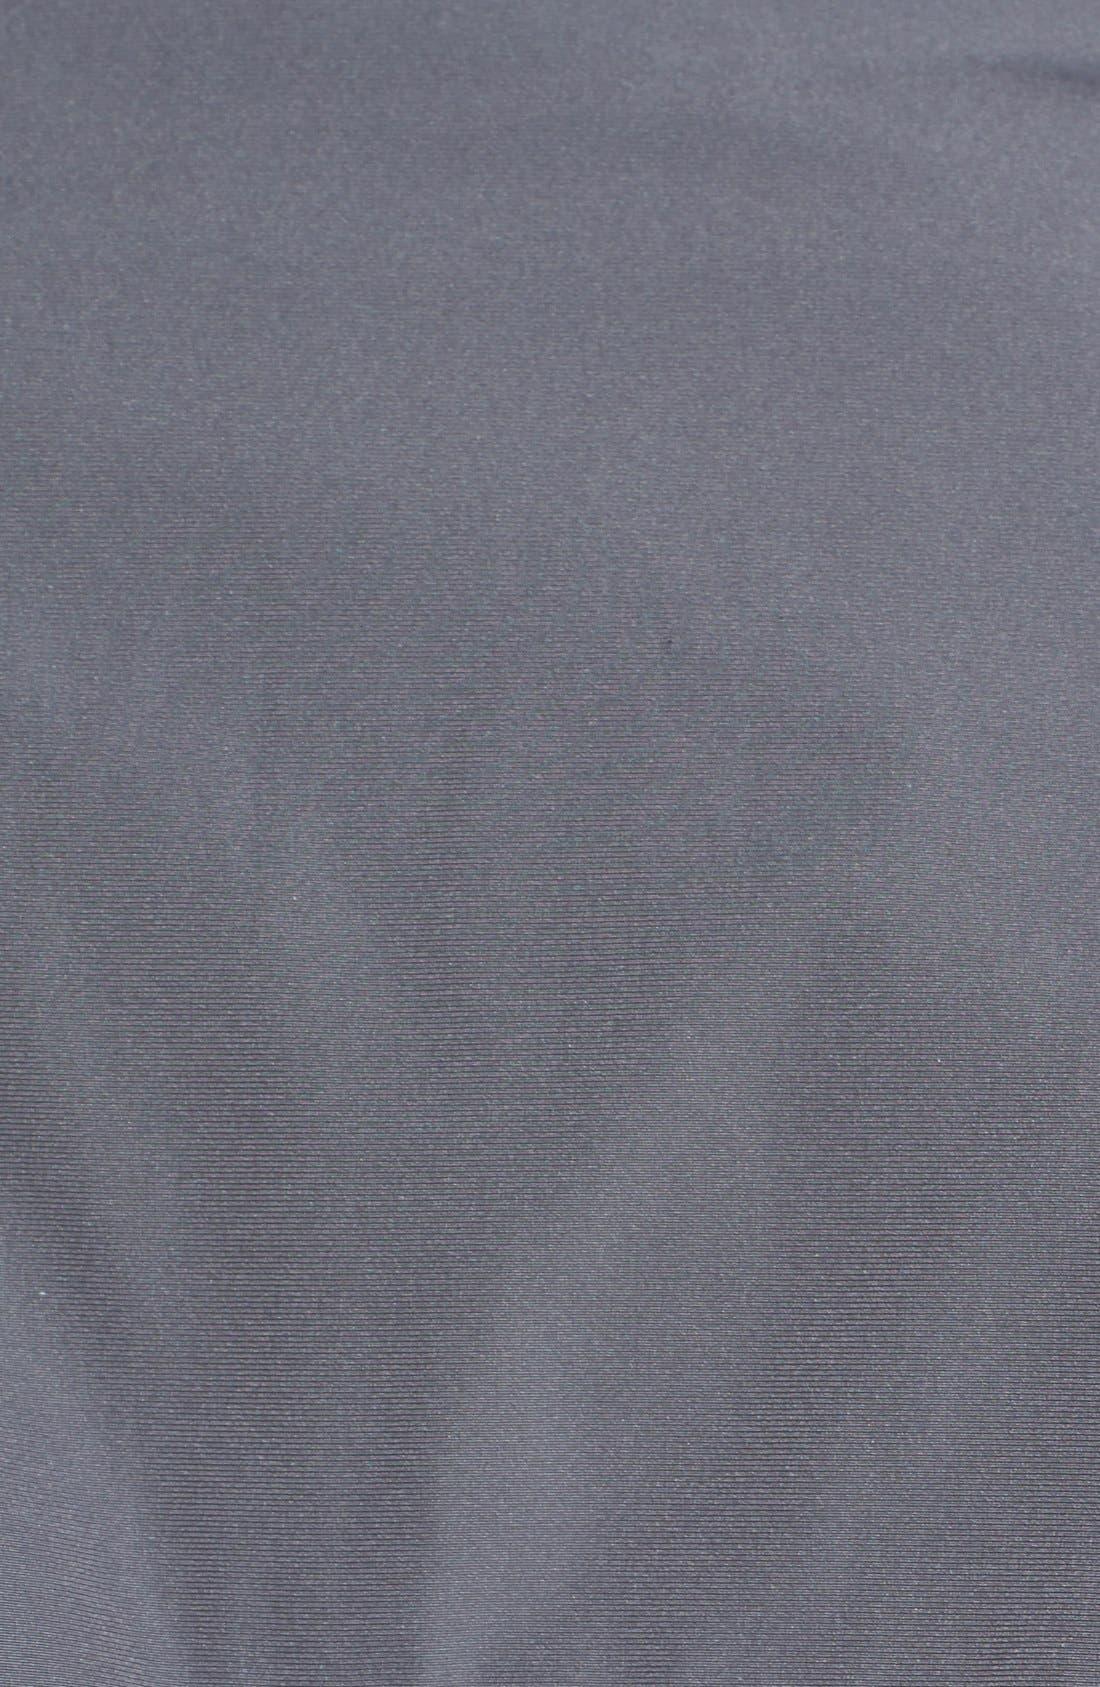 Alternate Image 3  - Burberry Brit 'Barkleigh' Military Jacket